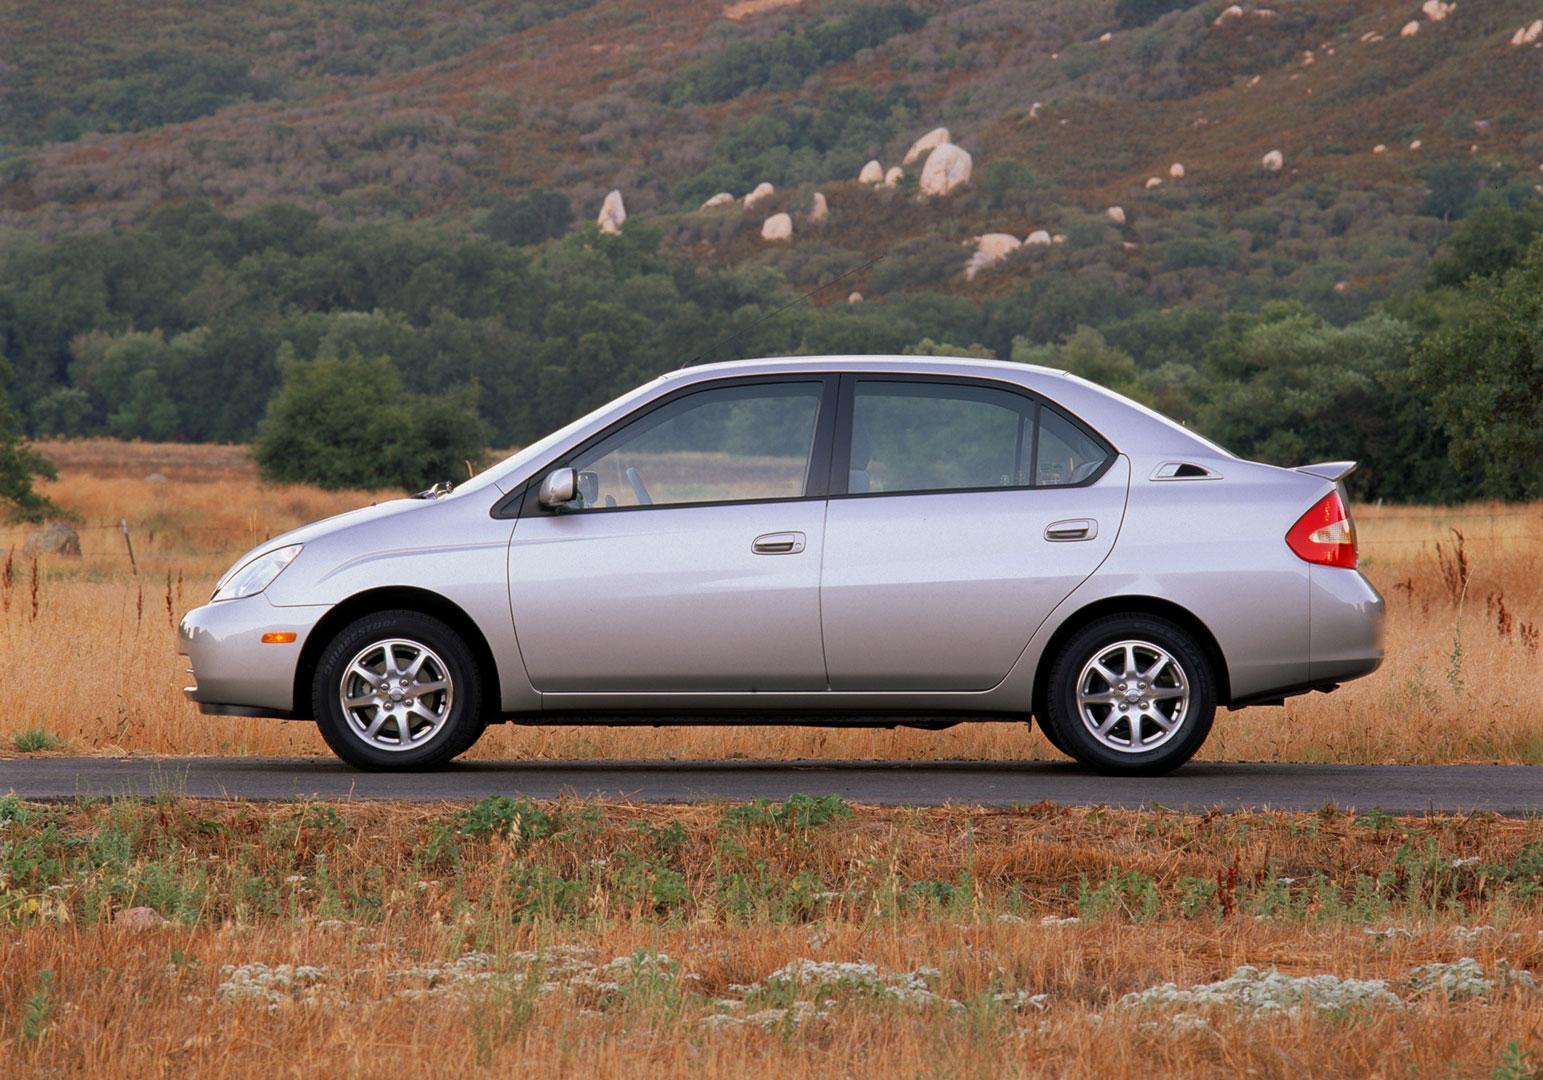 2003 Toyota Prius profile